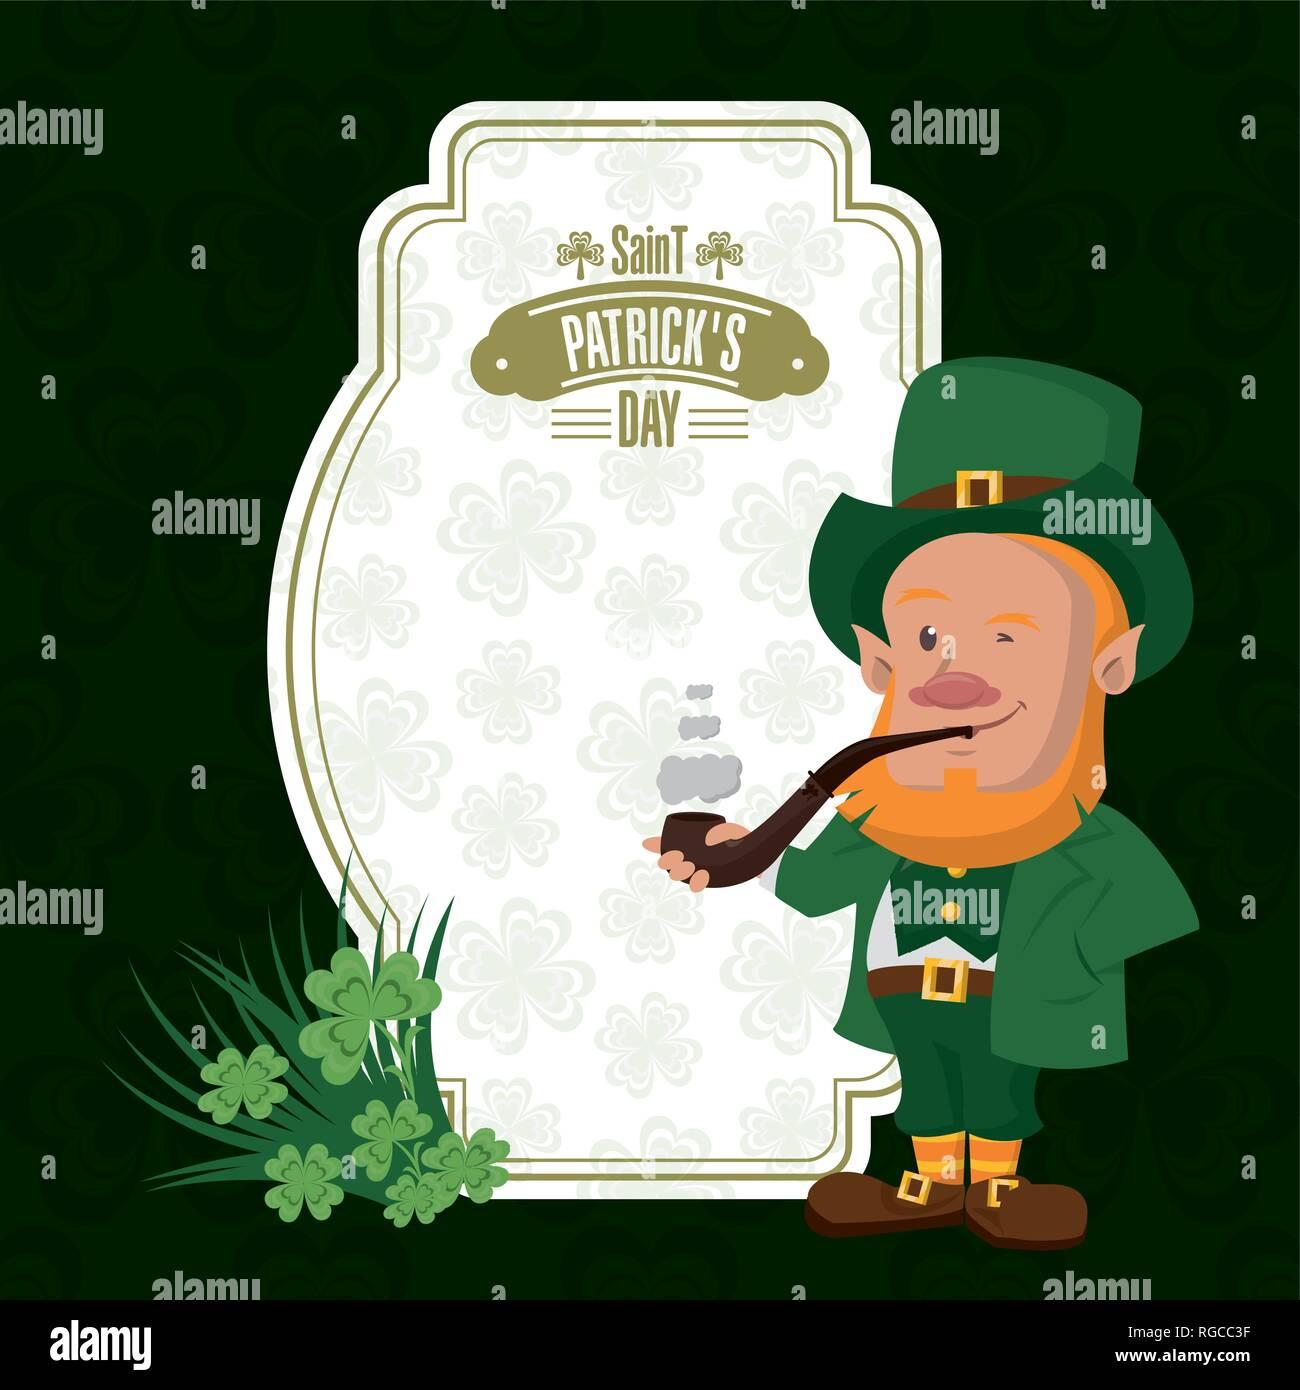 Saint patricks day card - Stock Vector